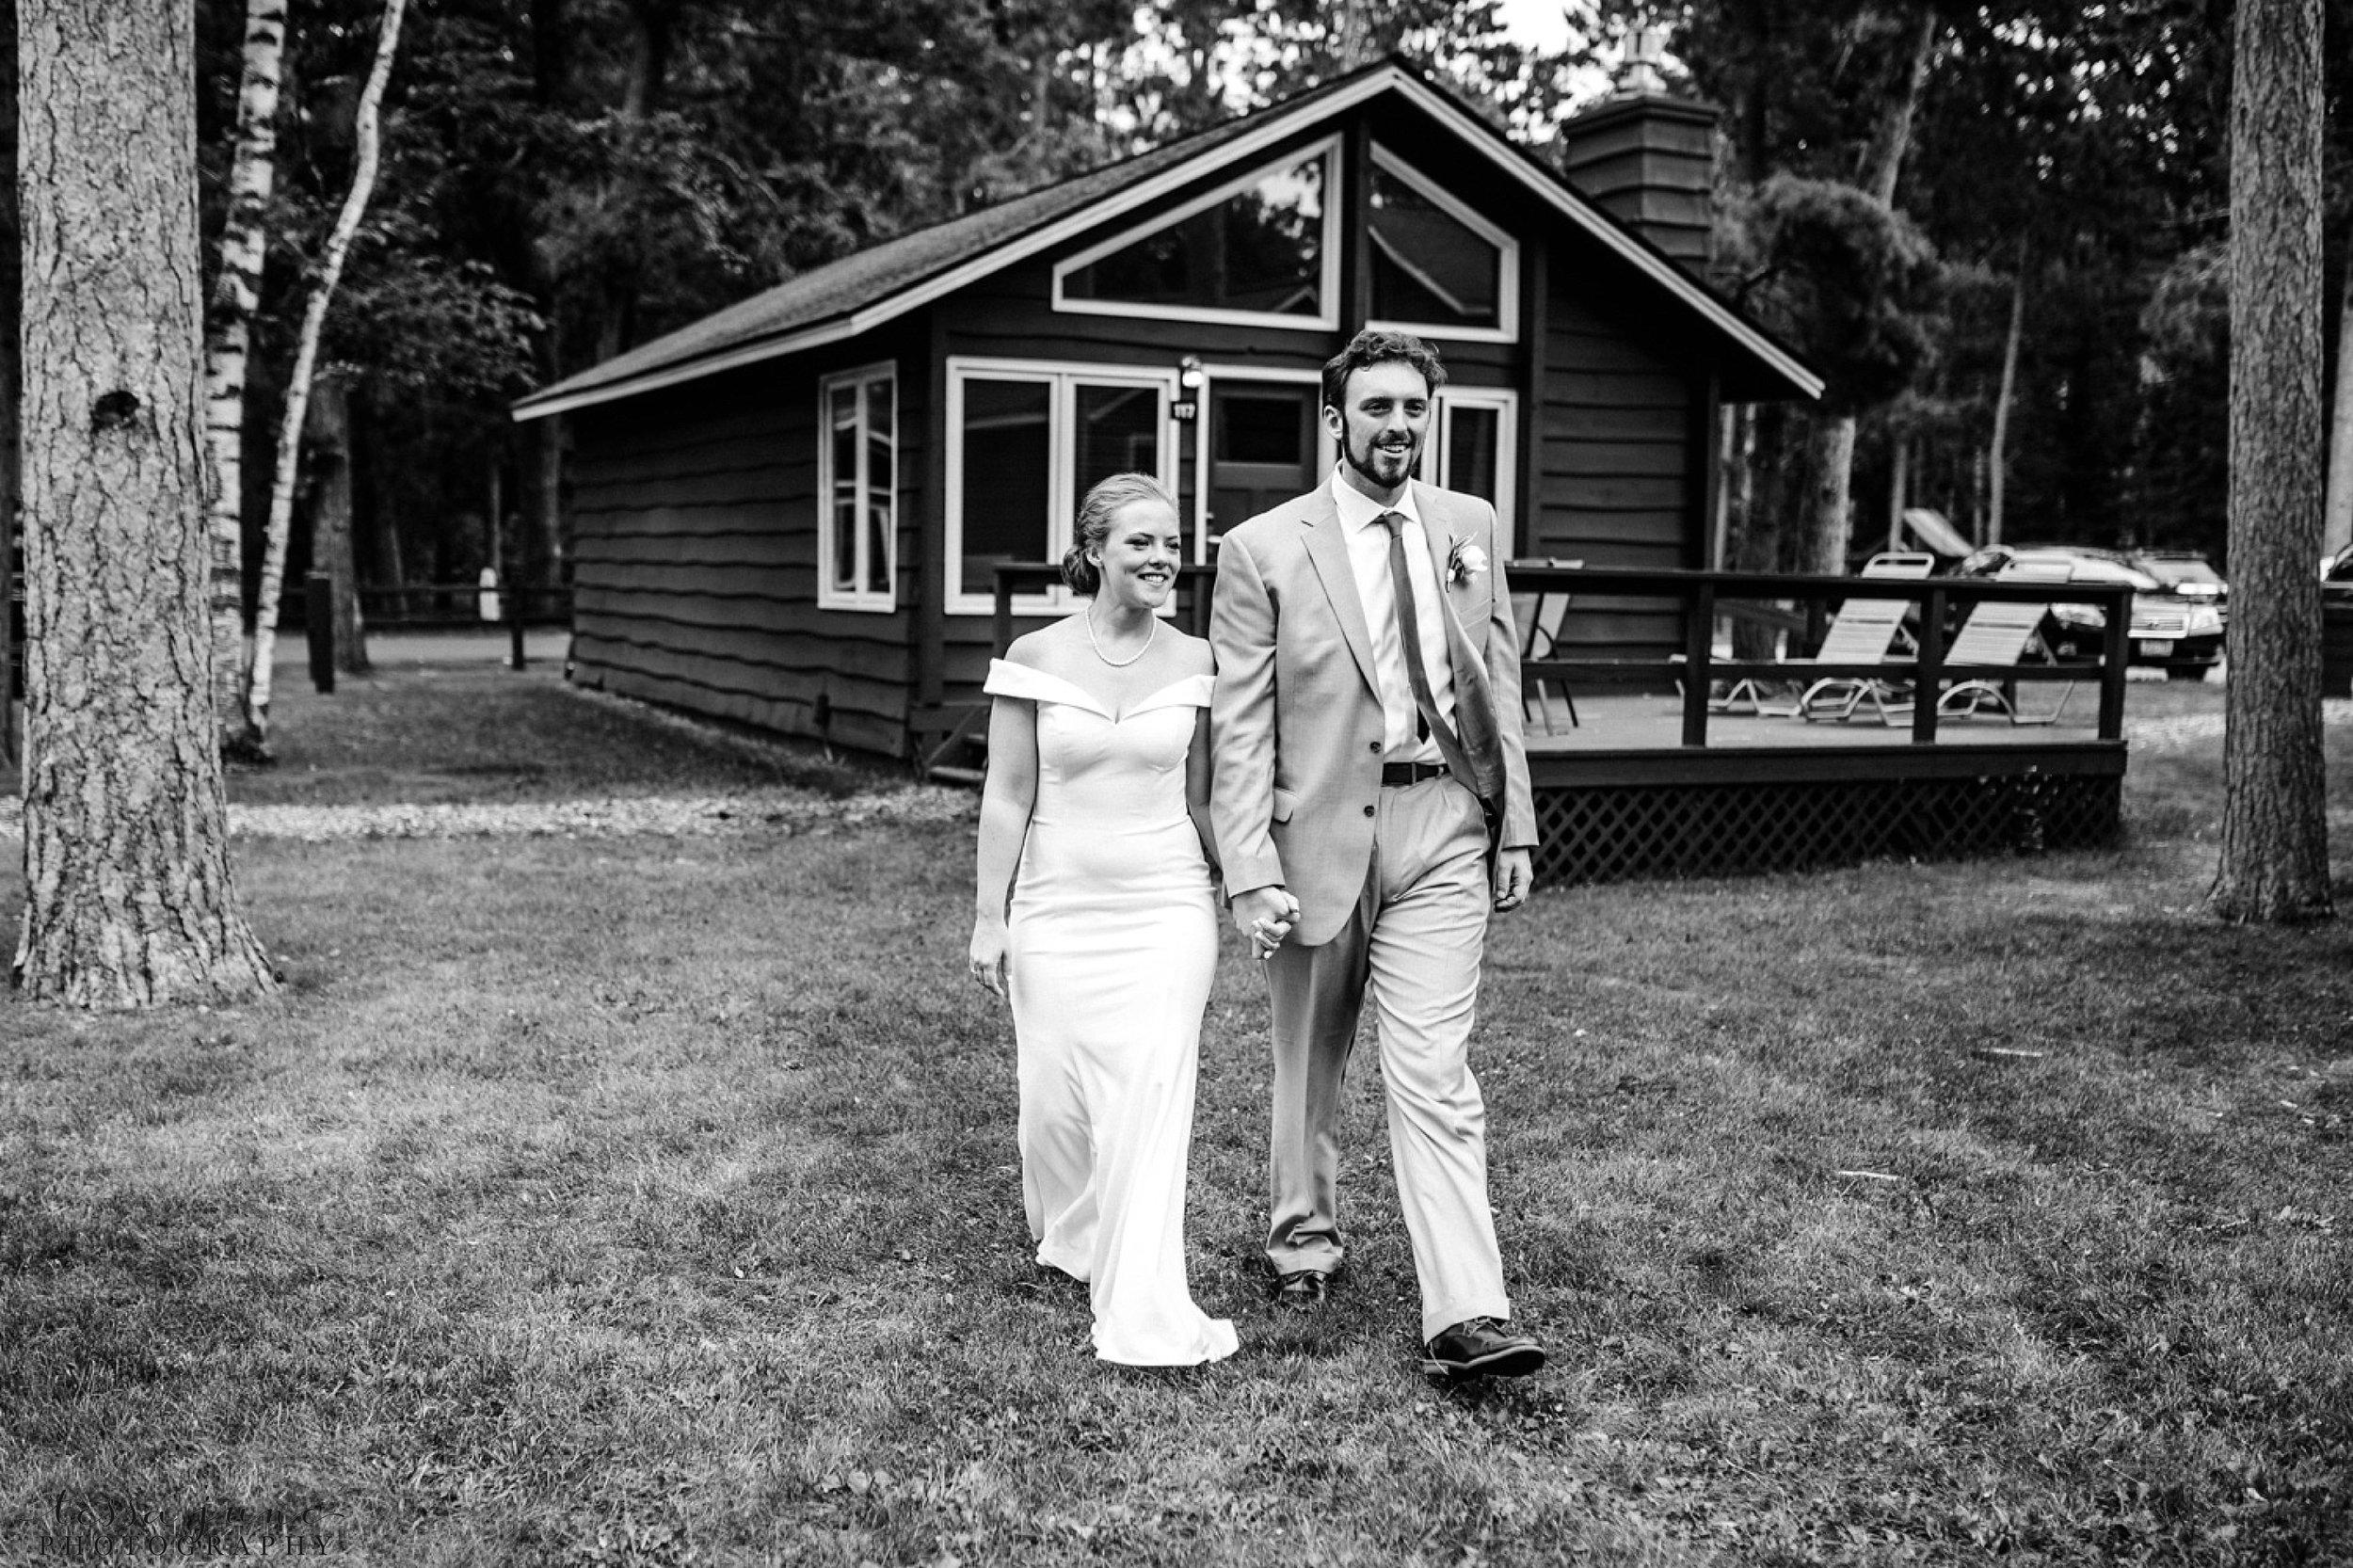 grandview-lodge-intimate-wedding-nisswa-minnesota_0077.jpg